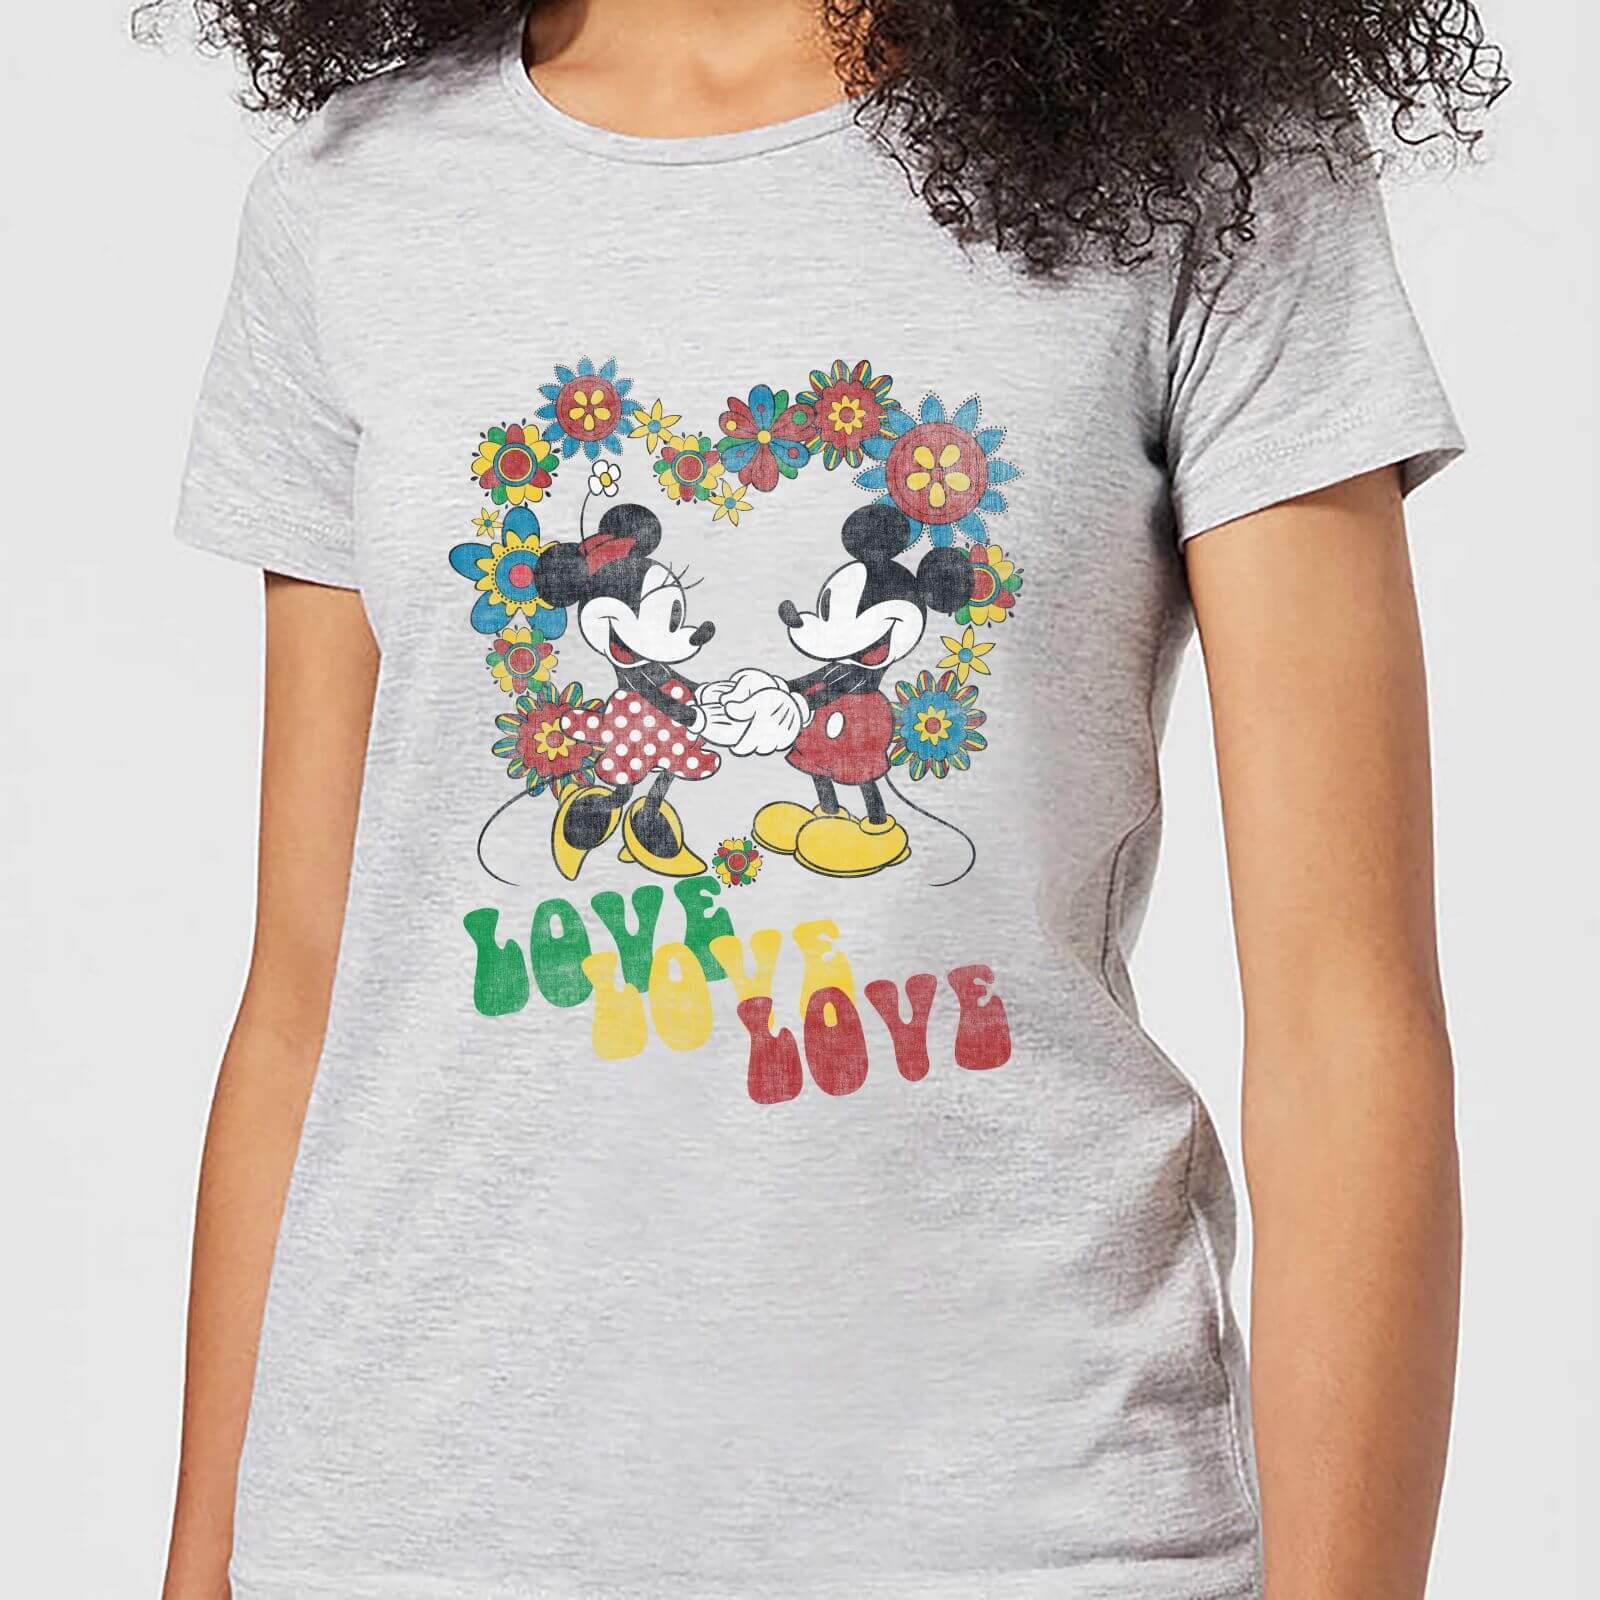 Disney Mickey Mouse Hippie Love Women's T-Shirt - Grey - S - Grey